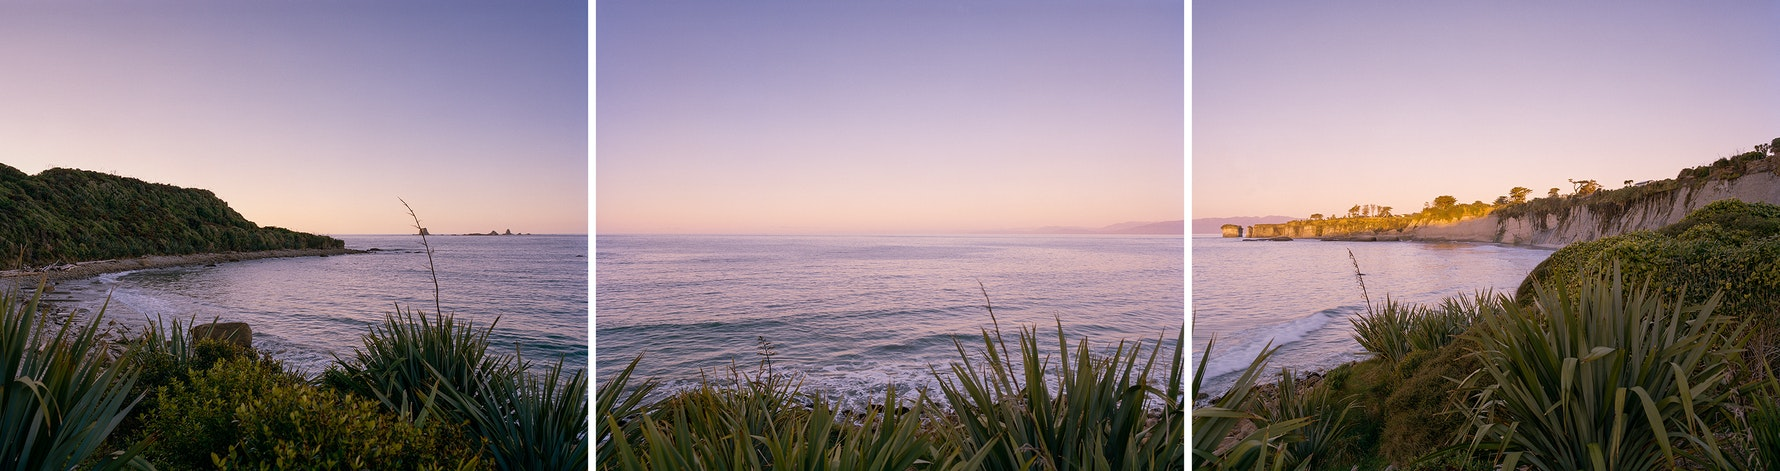 Gibsons Beach, Cape Foulwind, 2016